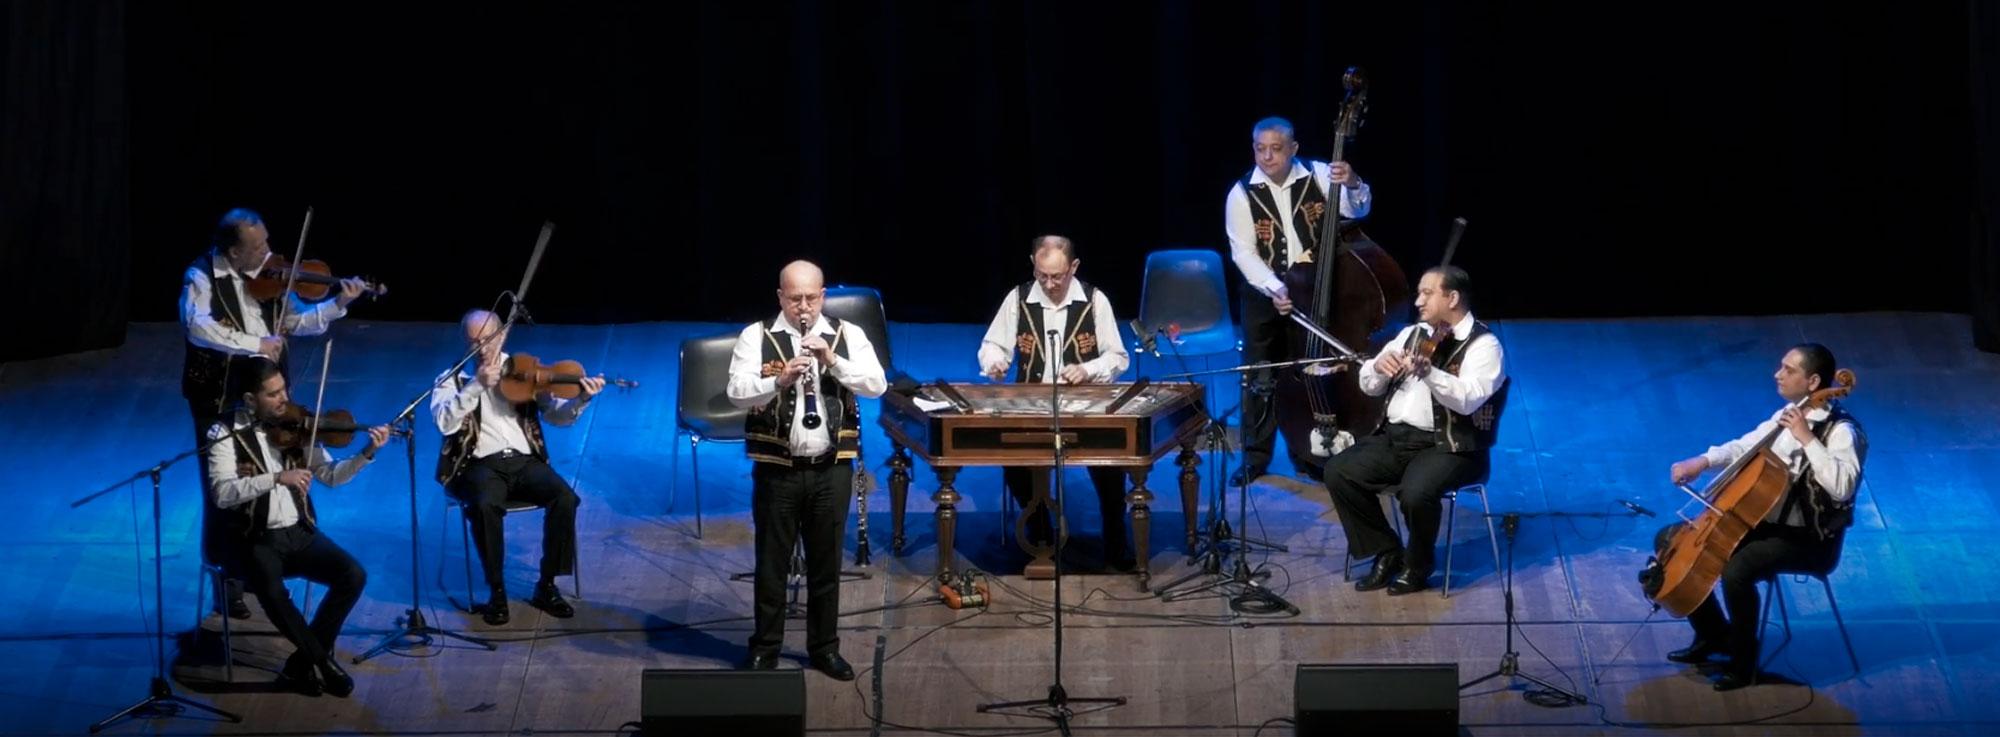 Barletta: Orchestra Tzigana di Budapest